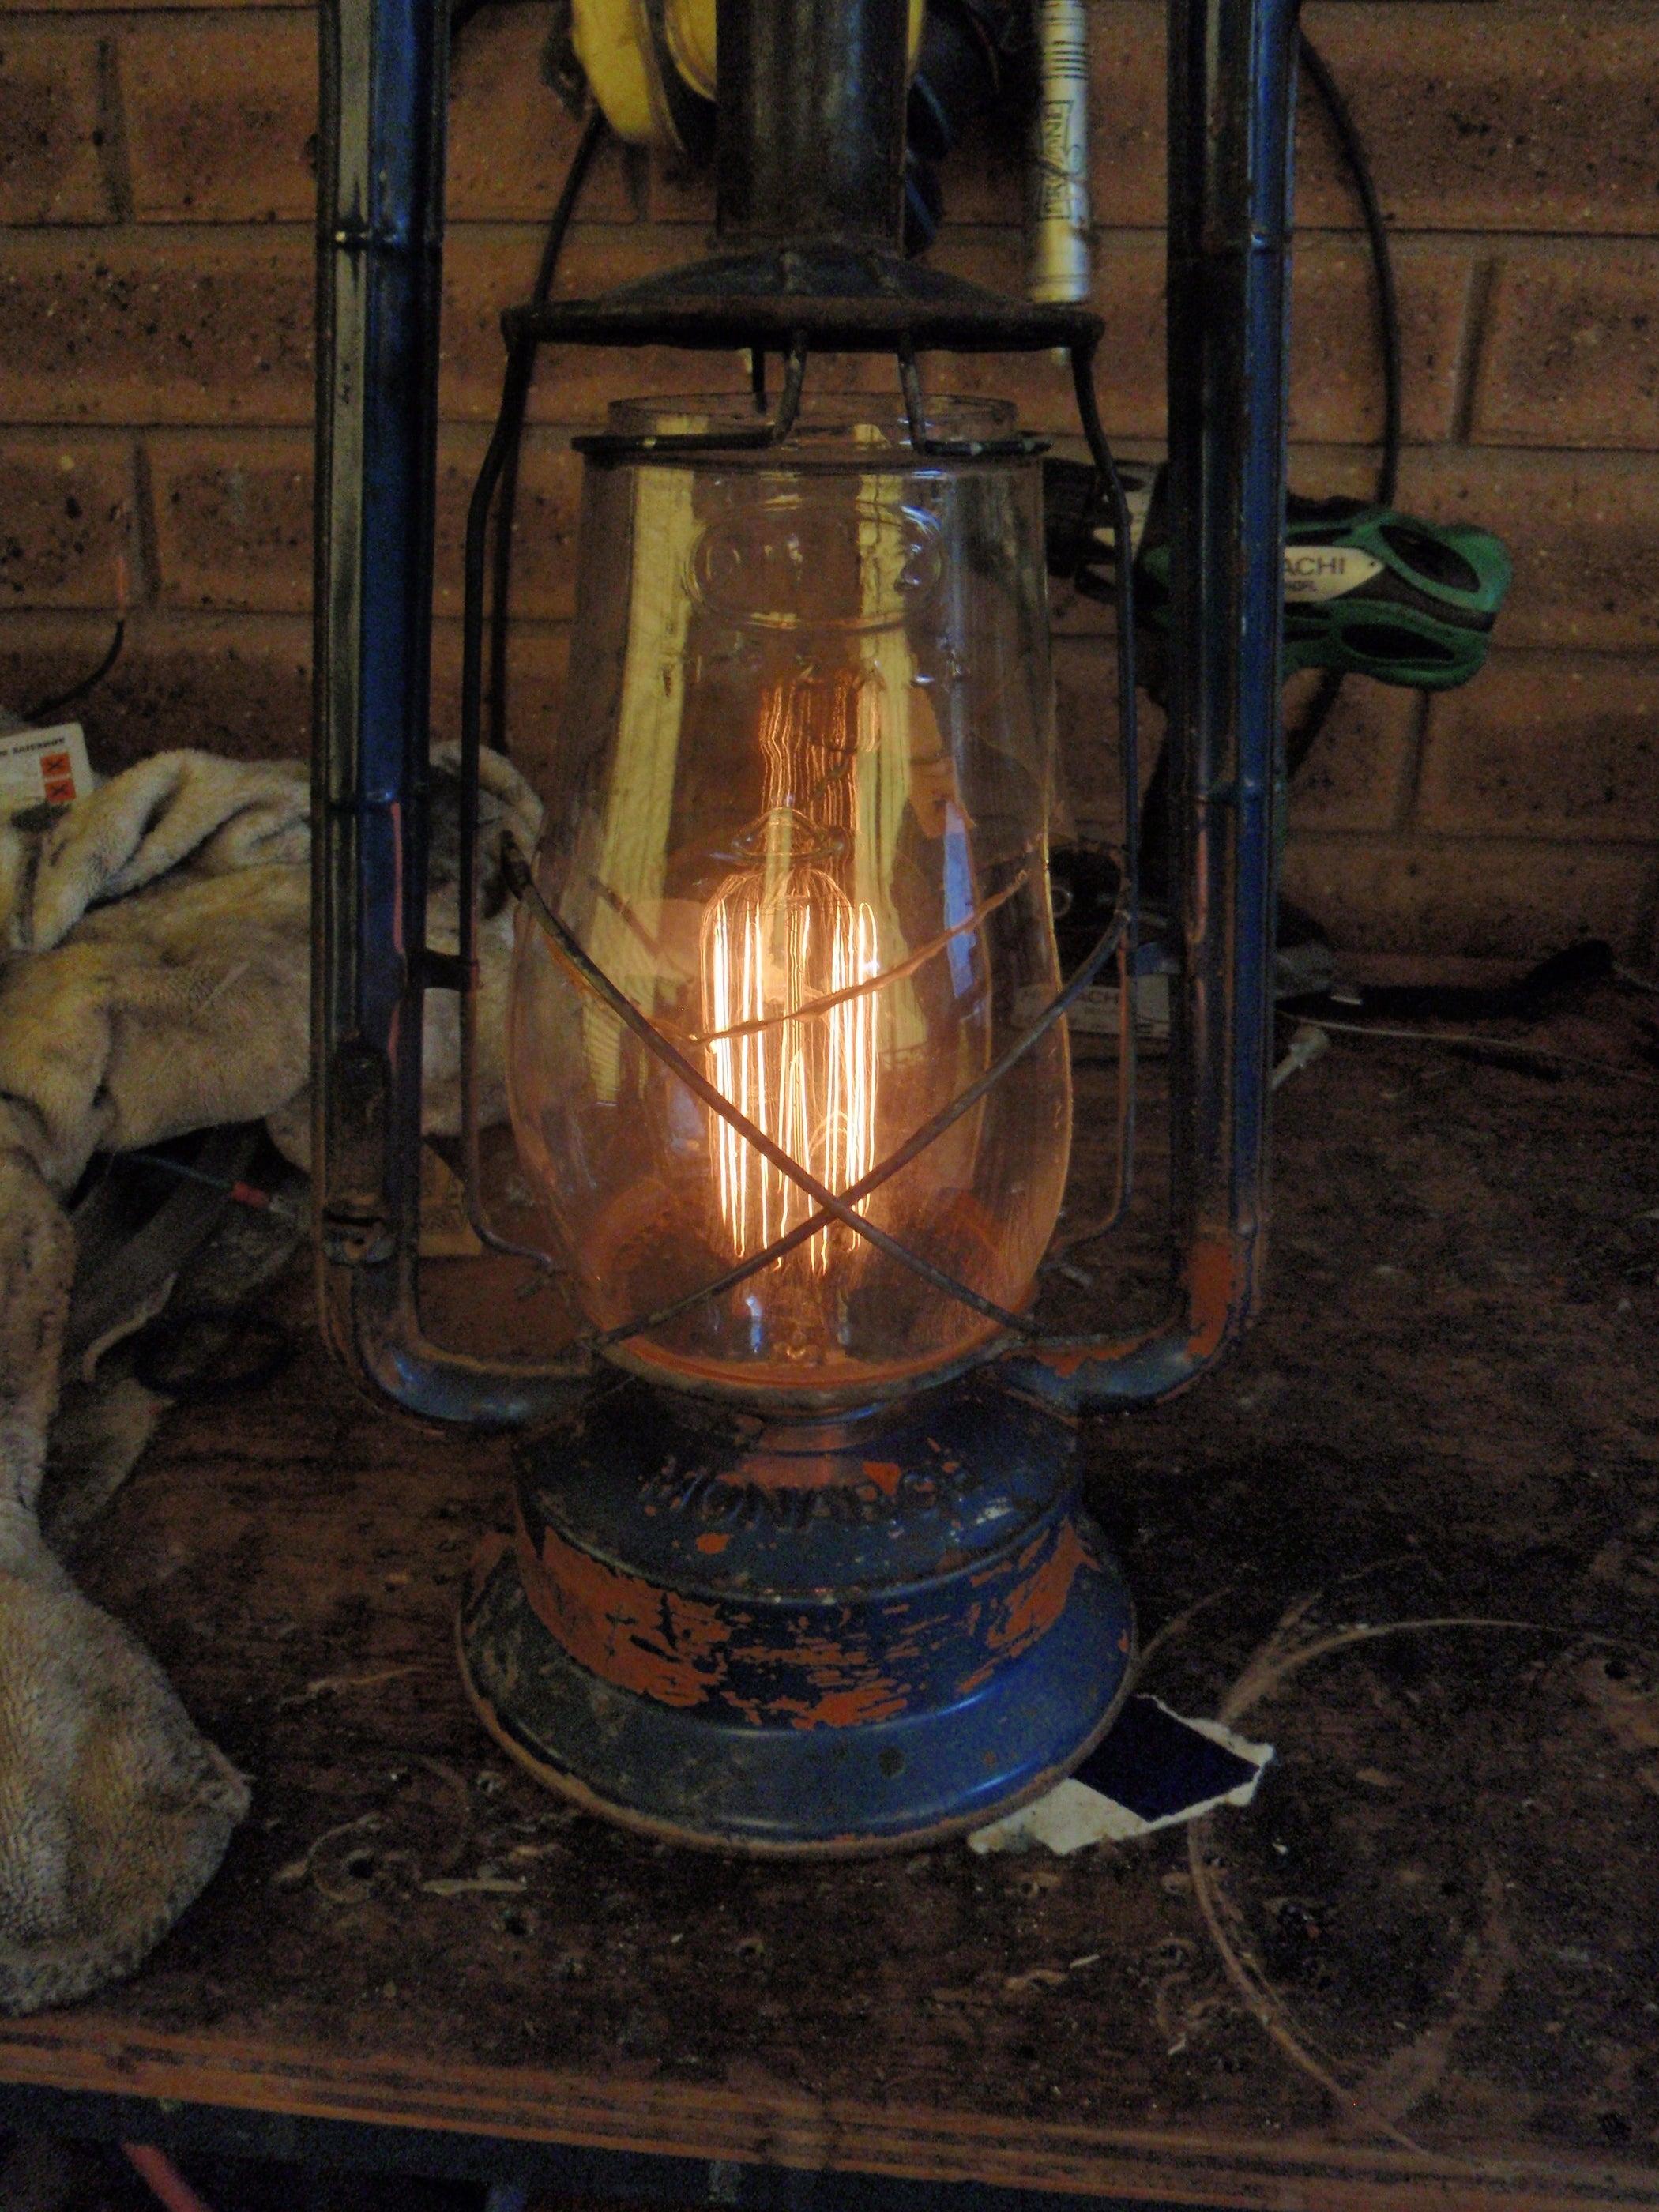 Marvelous Electric Lantern Table Lamps